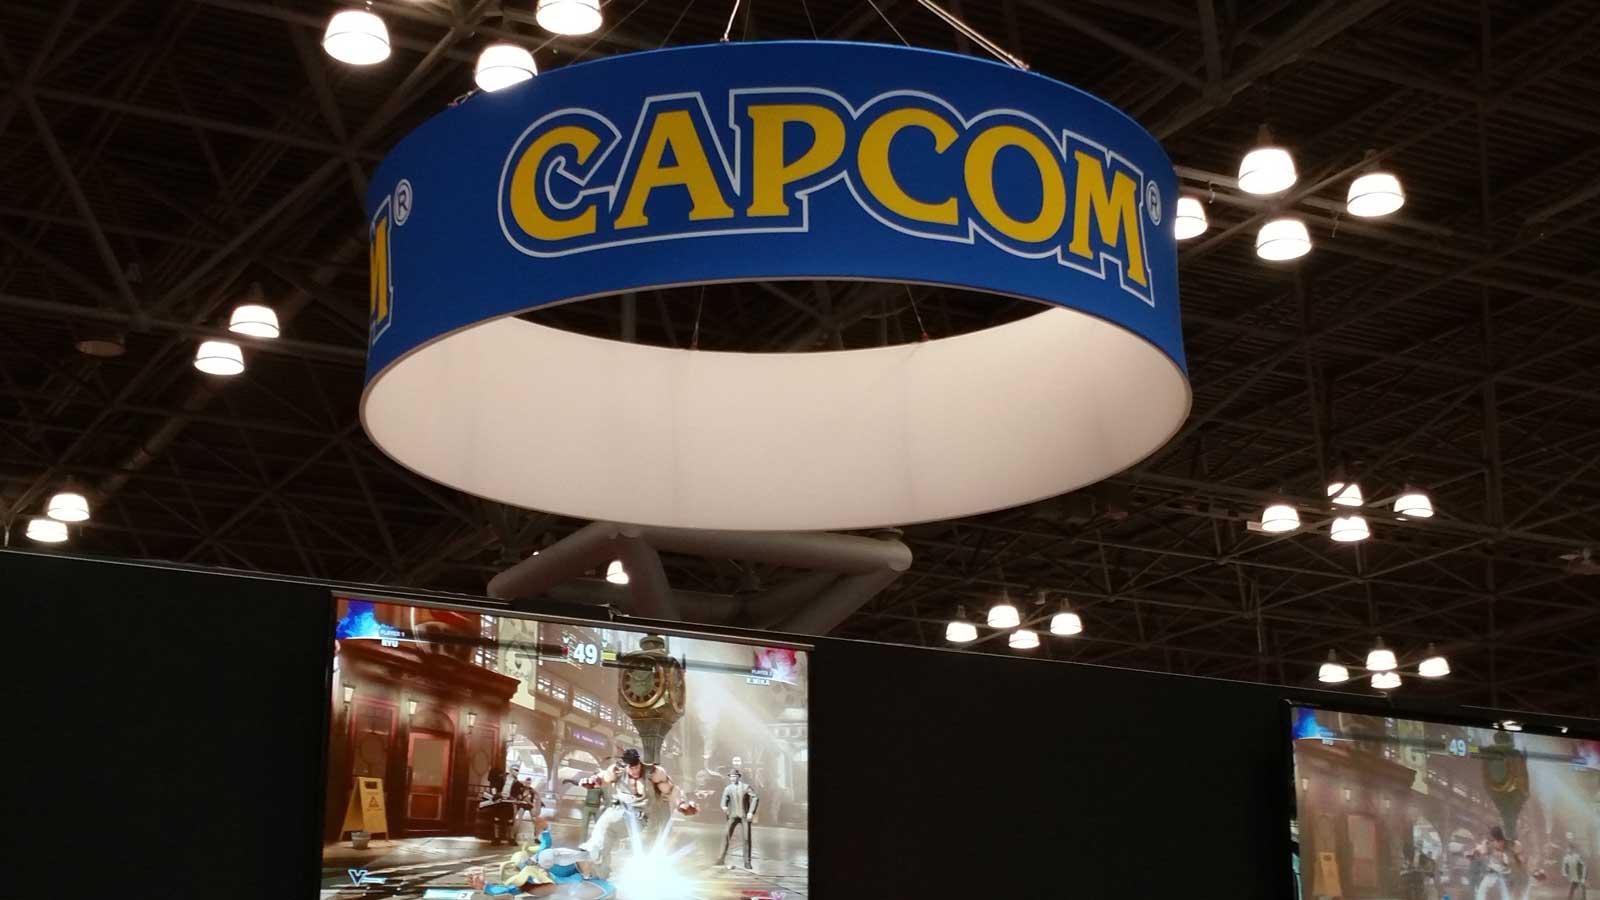 nyc-comiccon-capcom-display